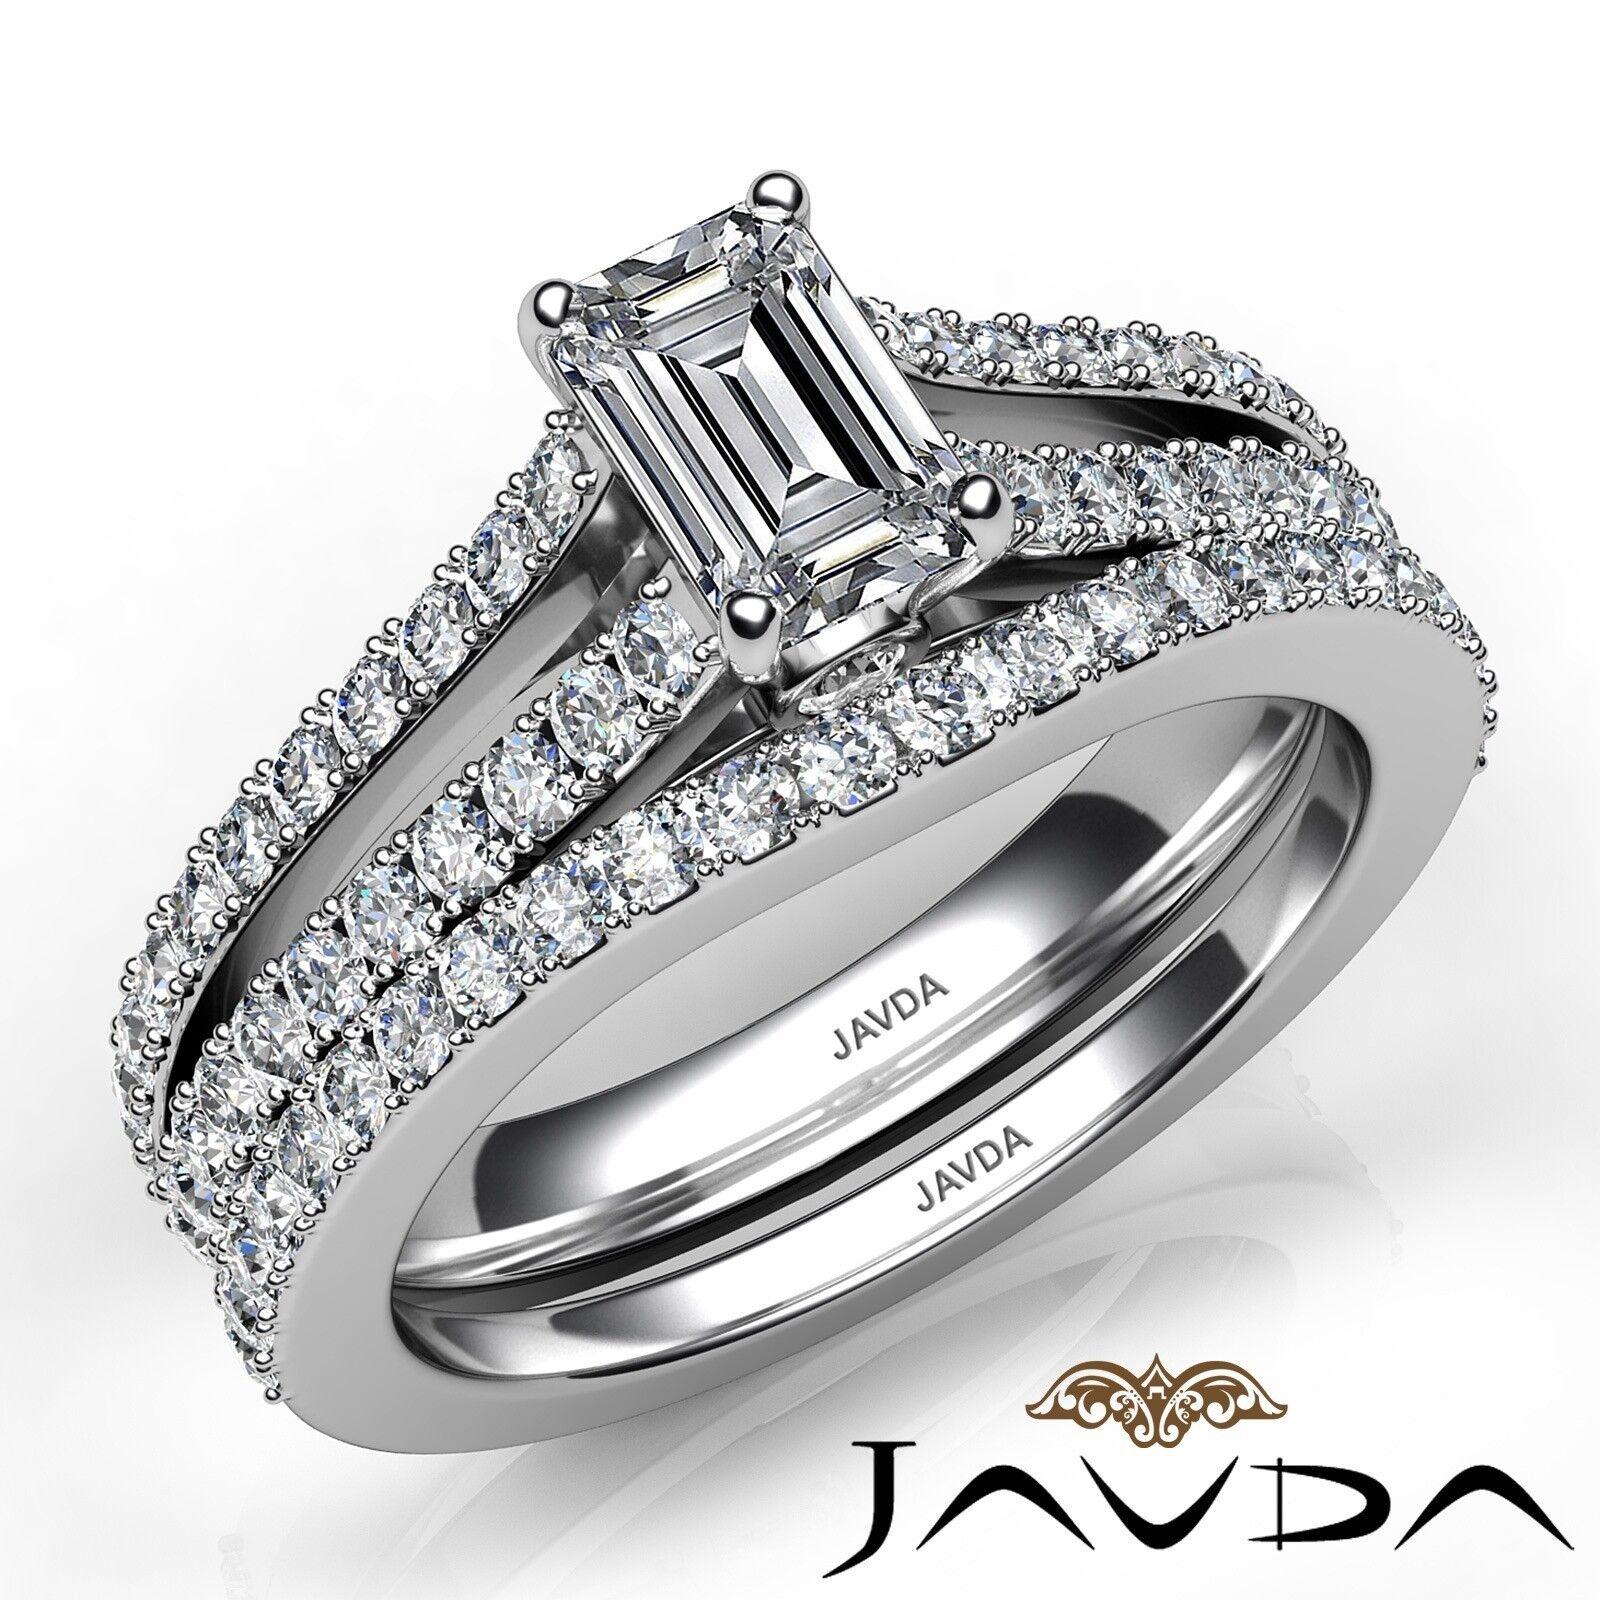 1.51ctw Split Shank Bezel Bridal Set Emerald Diamond Engagement Ring GIA E-VVS1 1